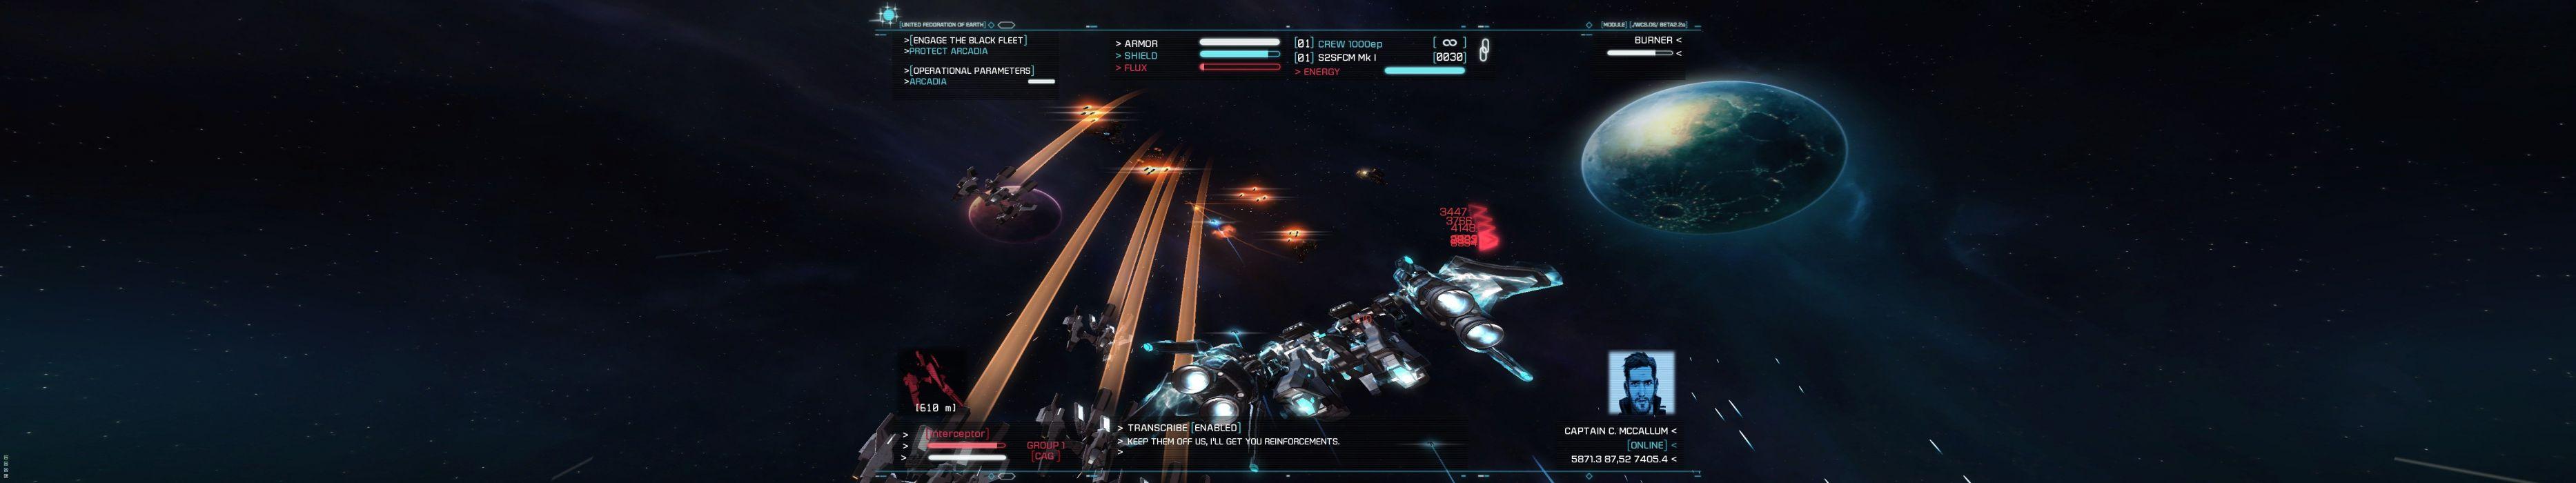 STRIKE SUIT ZERO space flight combat sci-fi spaceship simulator mecha (12) wallpaper